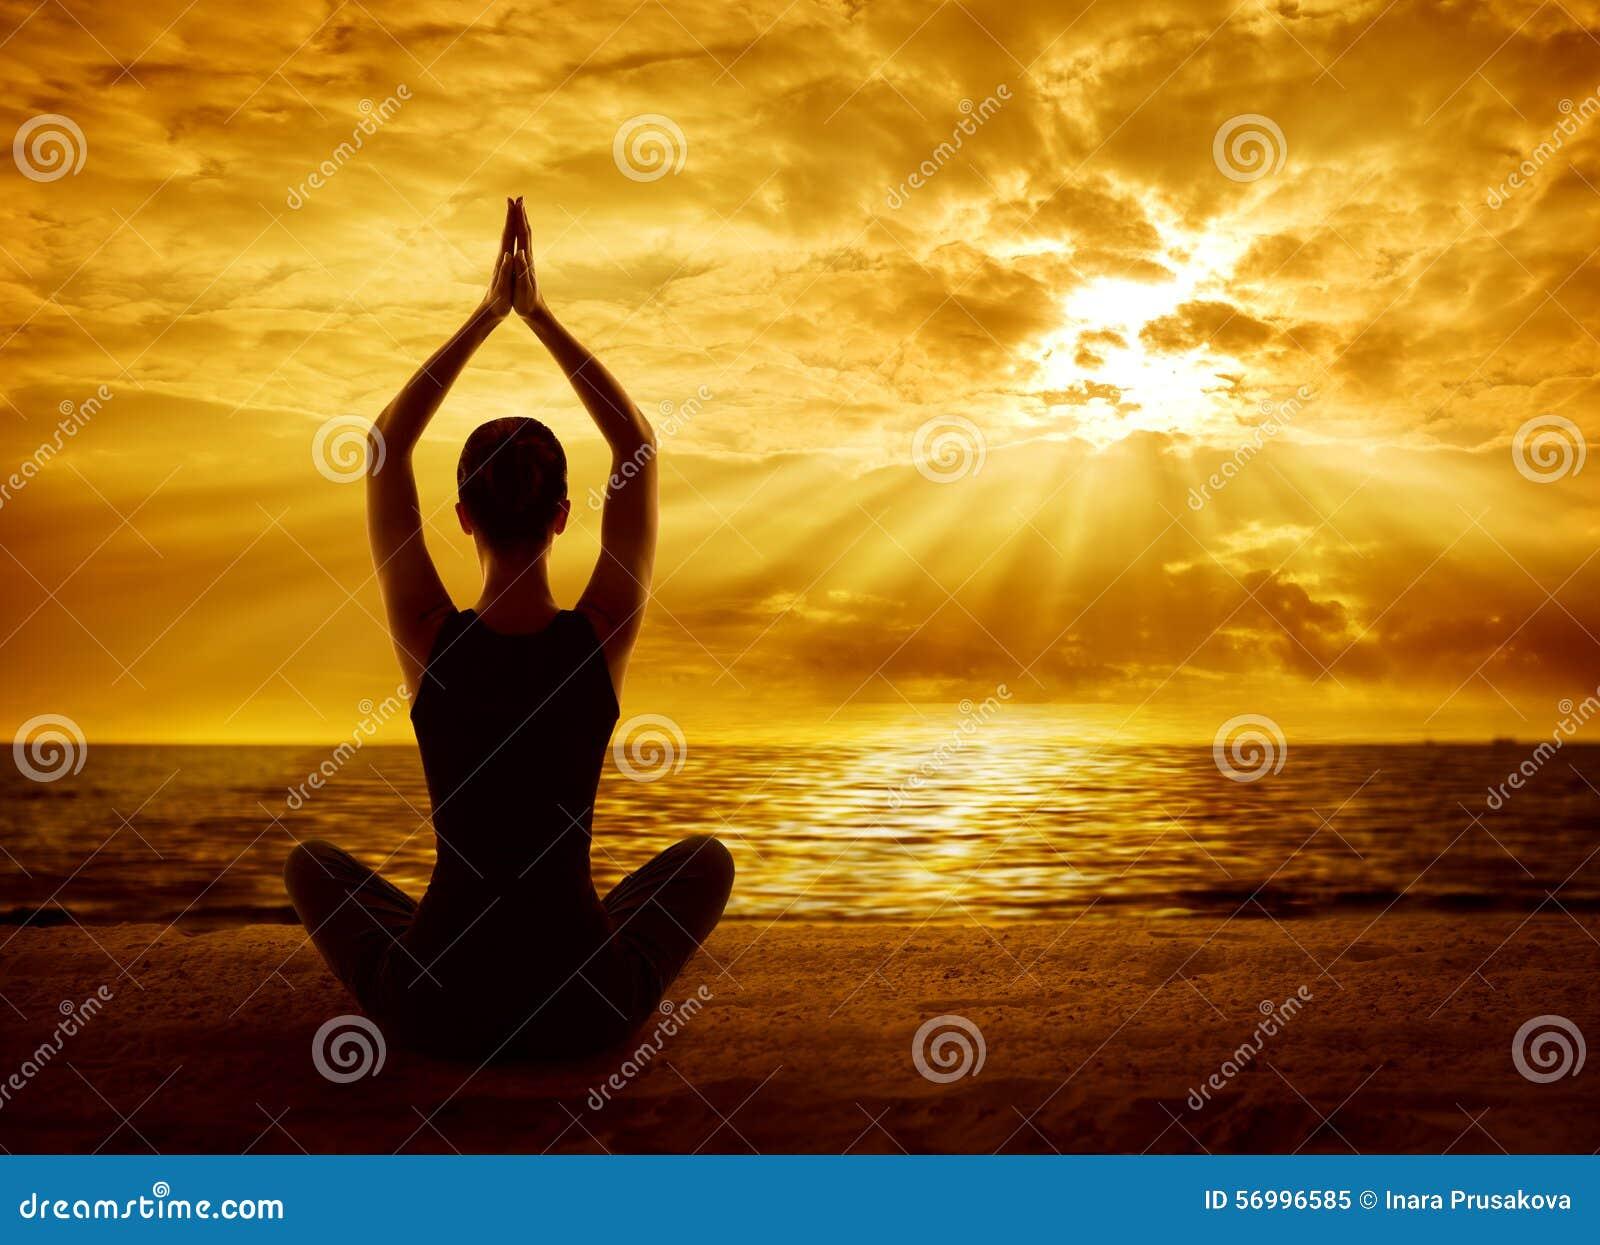 Concept de méditation de yoga, méditer sain de silhouette de femme